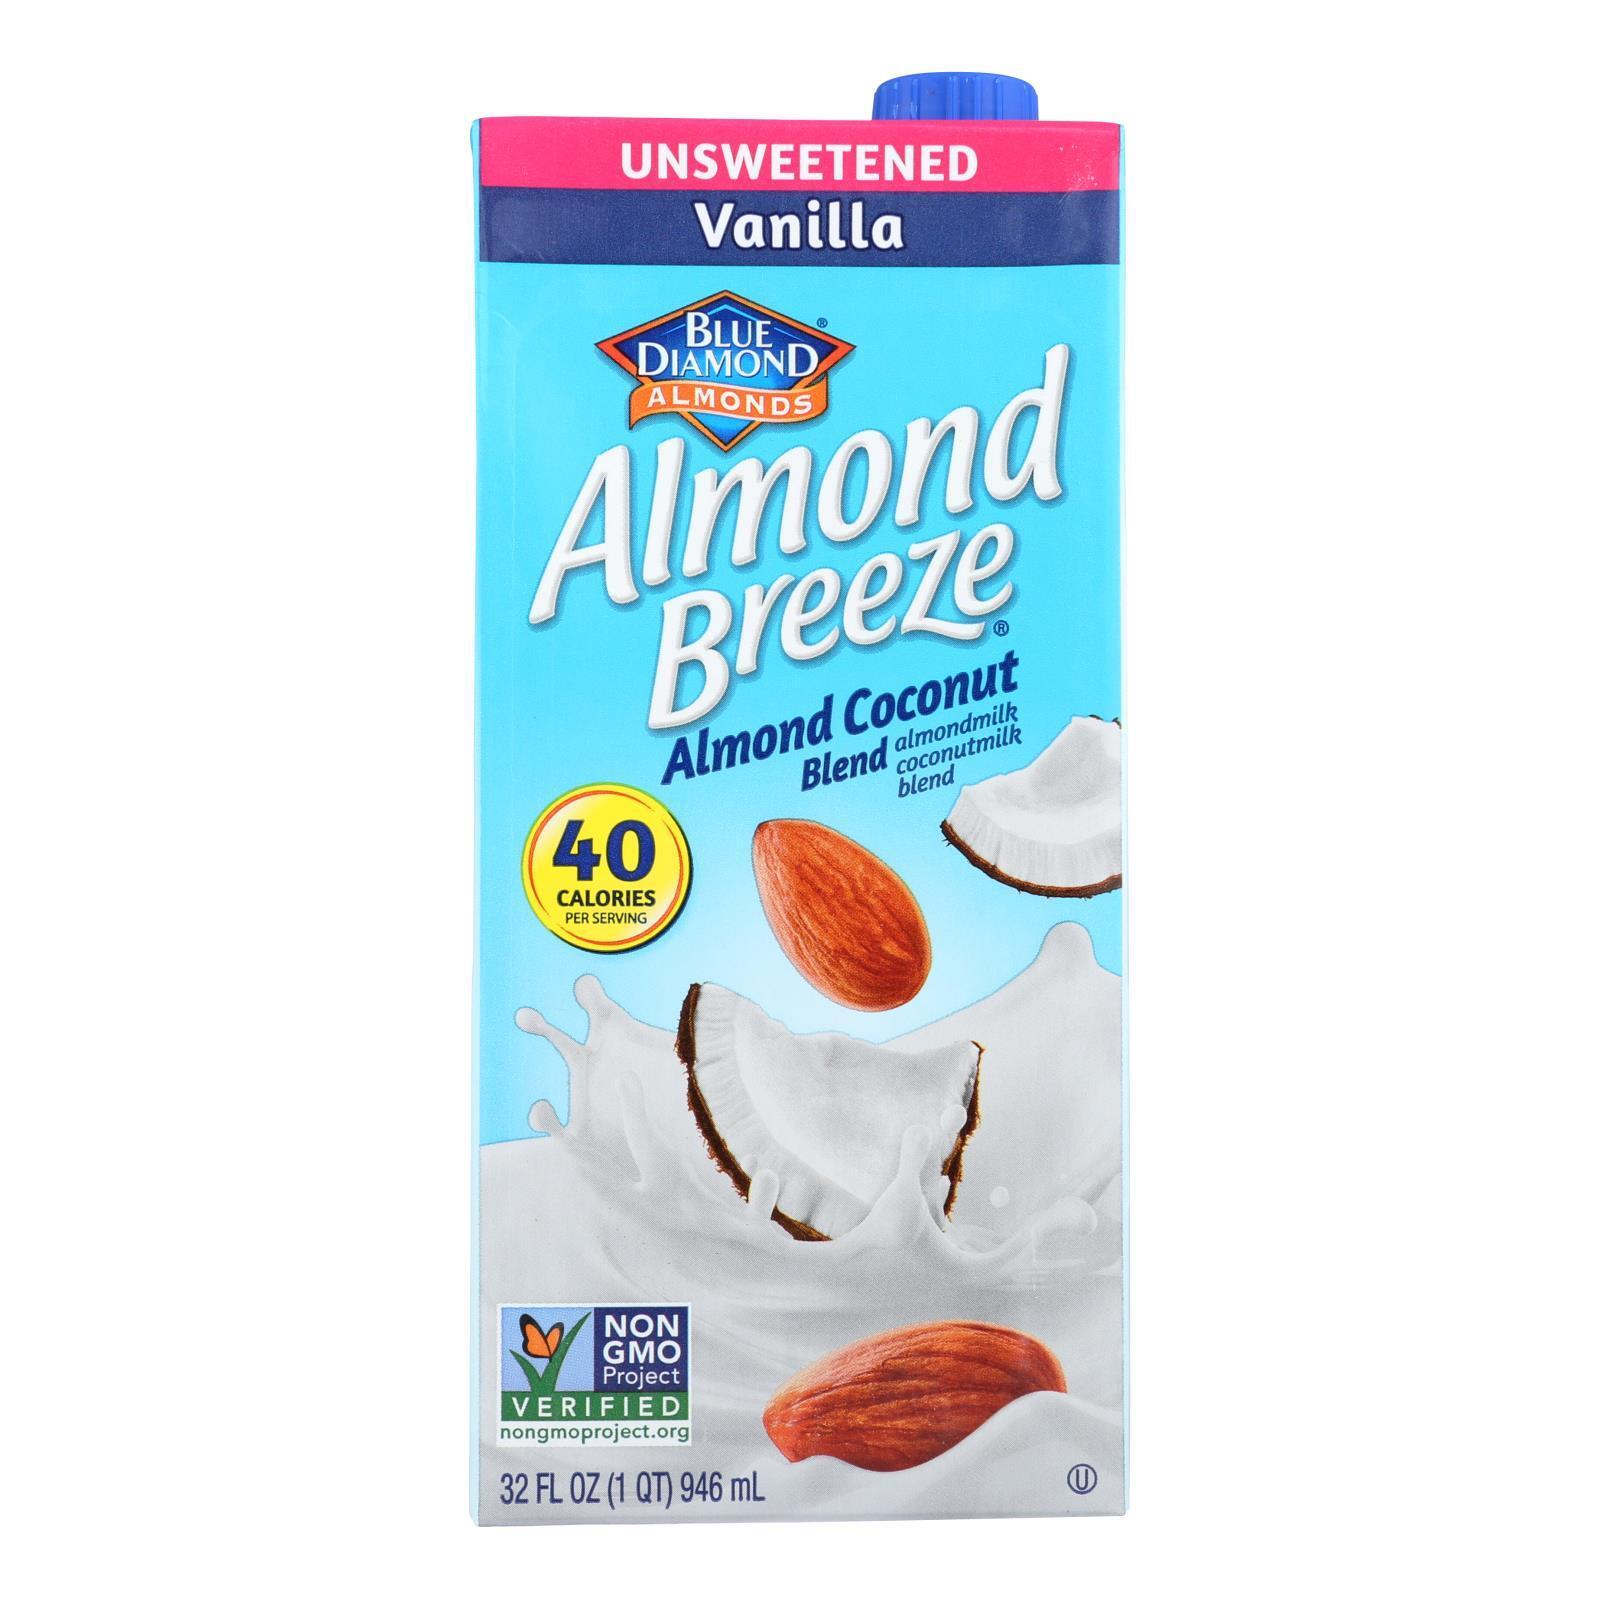 Almond Breeze Almondmilk Coconutmilk Blended - Vanilla Almond Coconut - Case of 12 - 32 fl oz